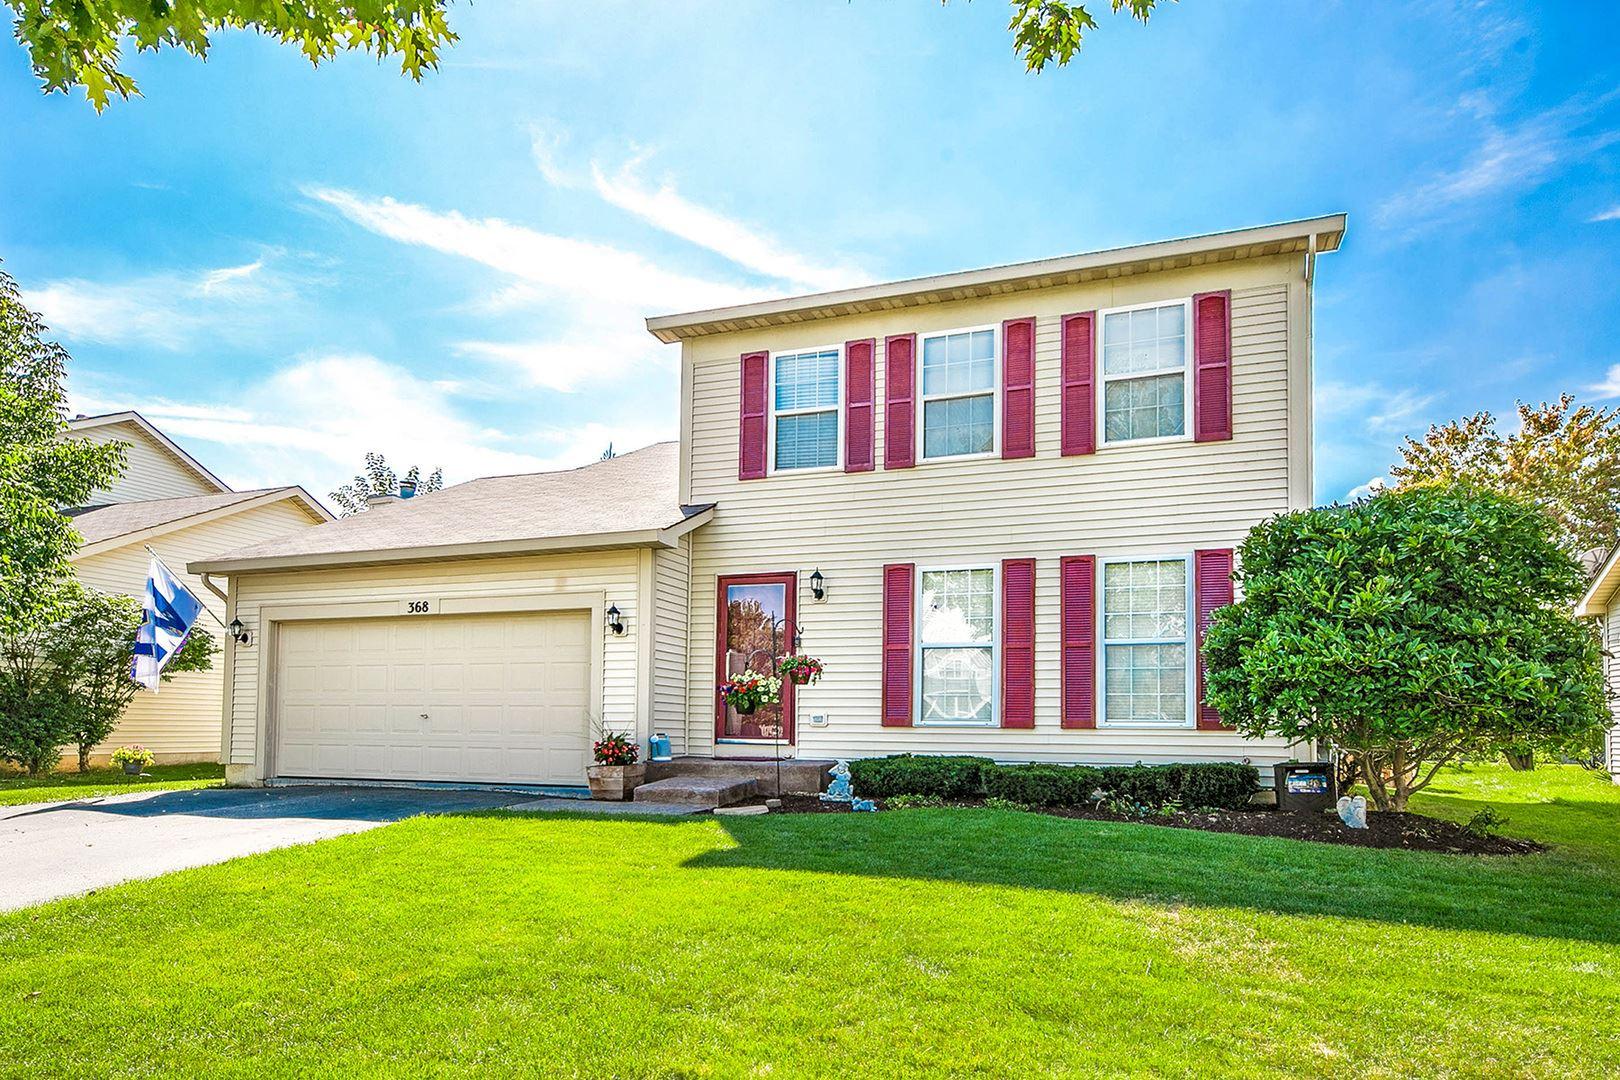 Photo of 368 Wedgewood Circle, Romeoville, IL 60446 (MLS # 10916902)